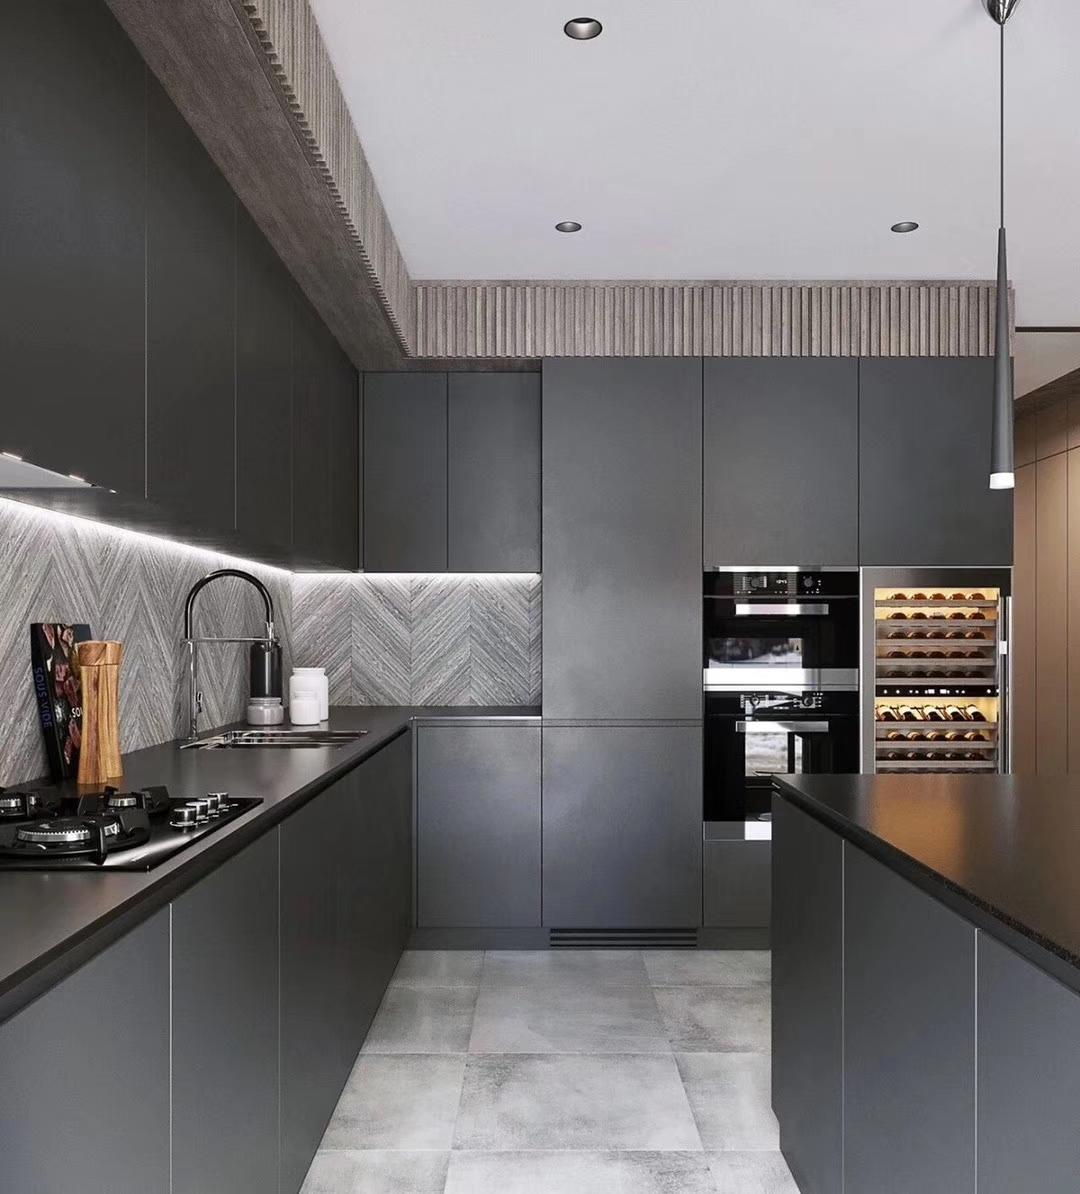 Modular Black Melamine Kitchen Cabinets Modern Picture Australia ...